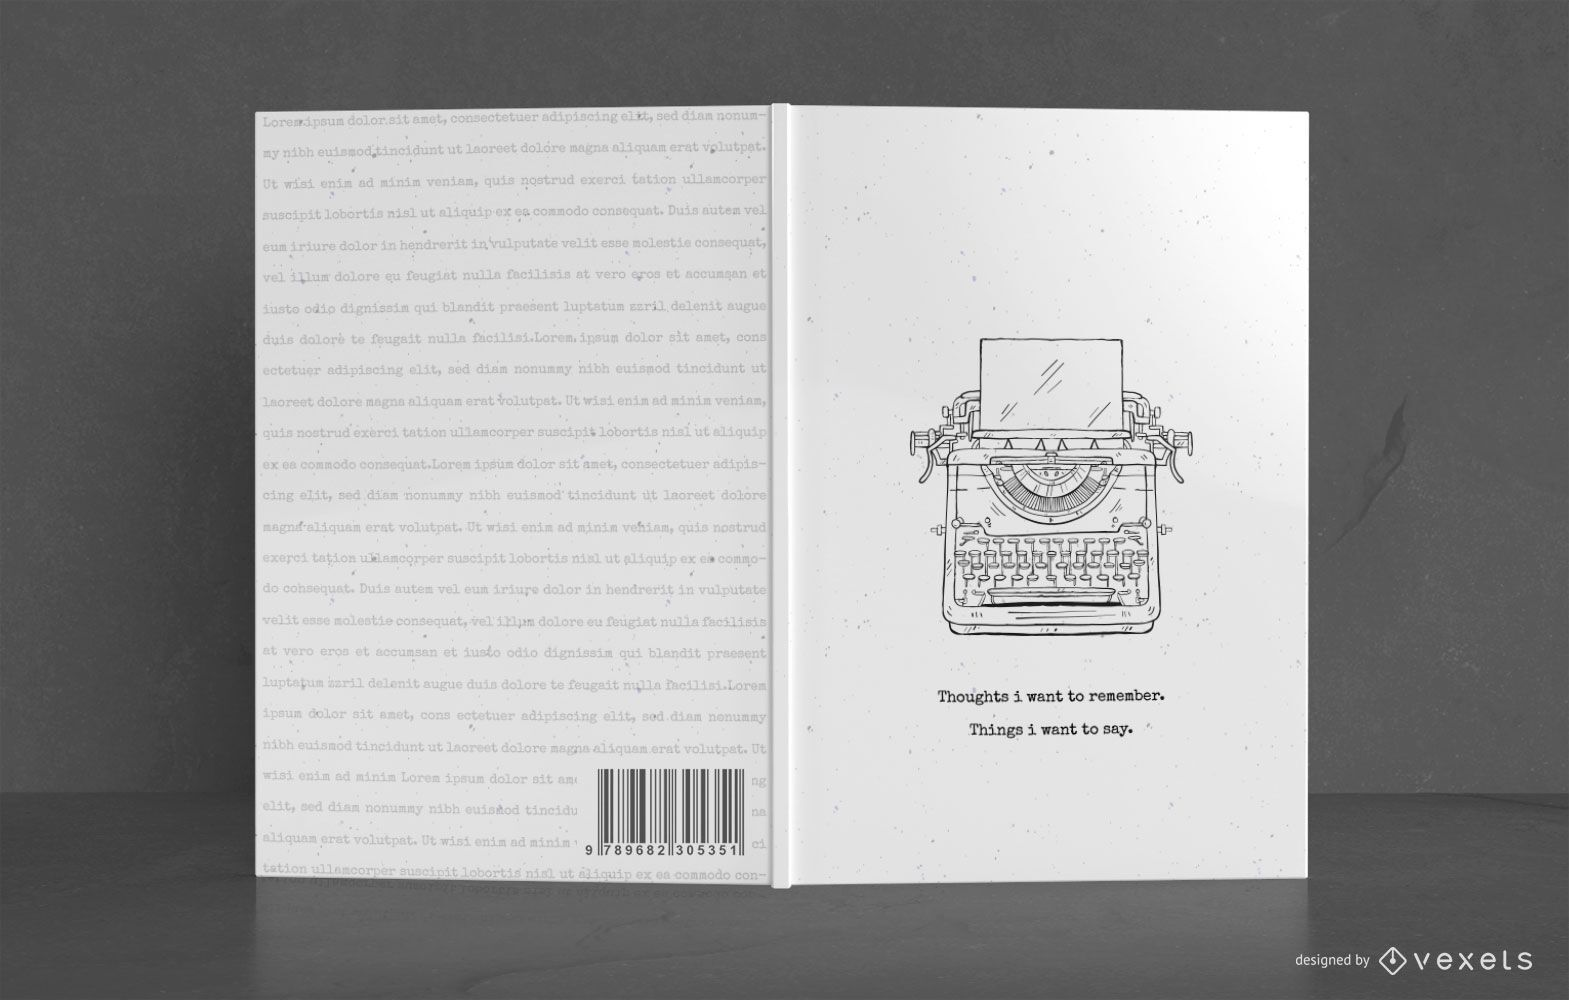 Diseño de portada de libro de escritor